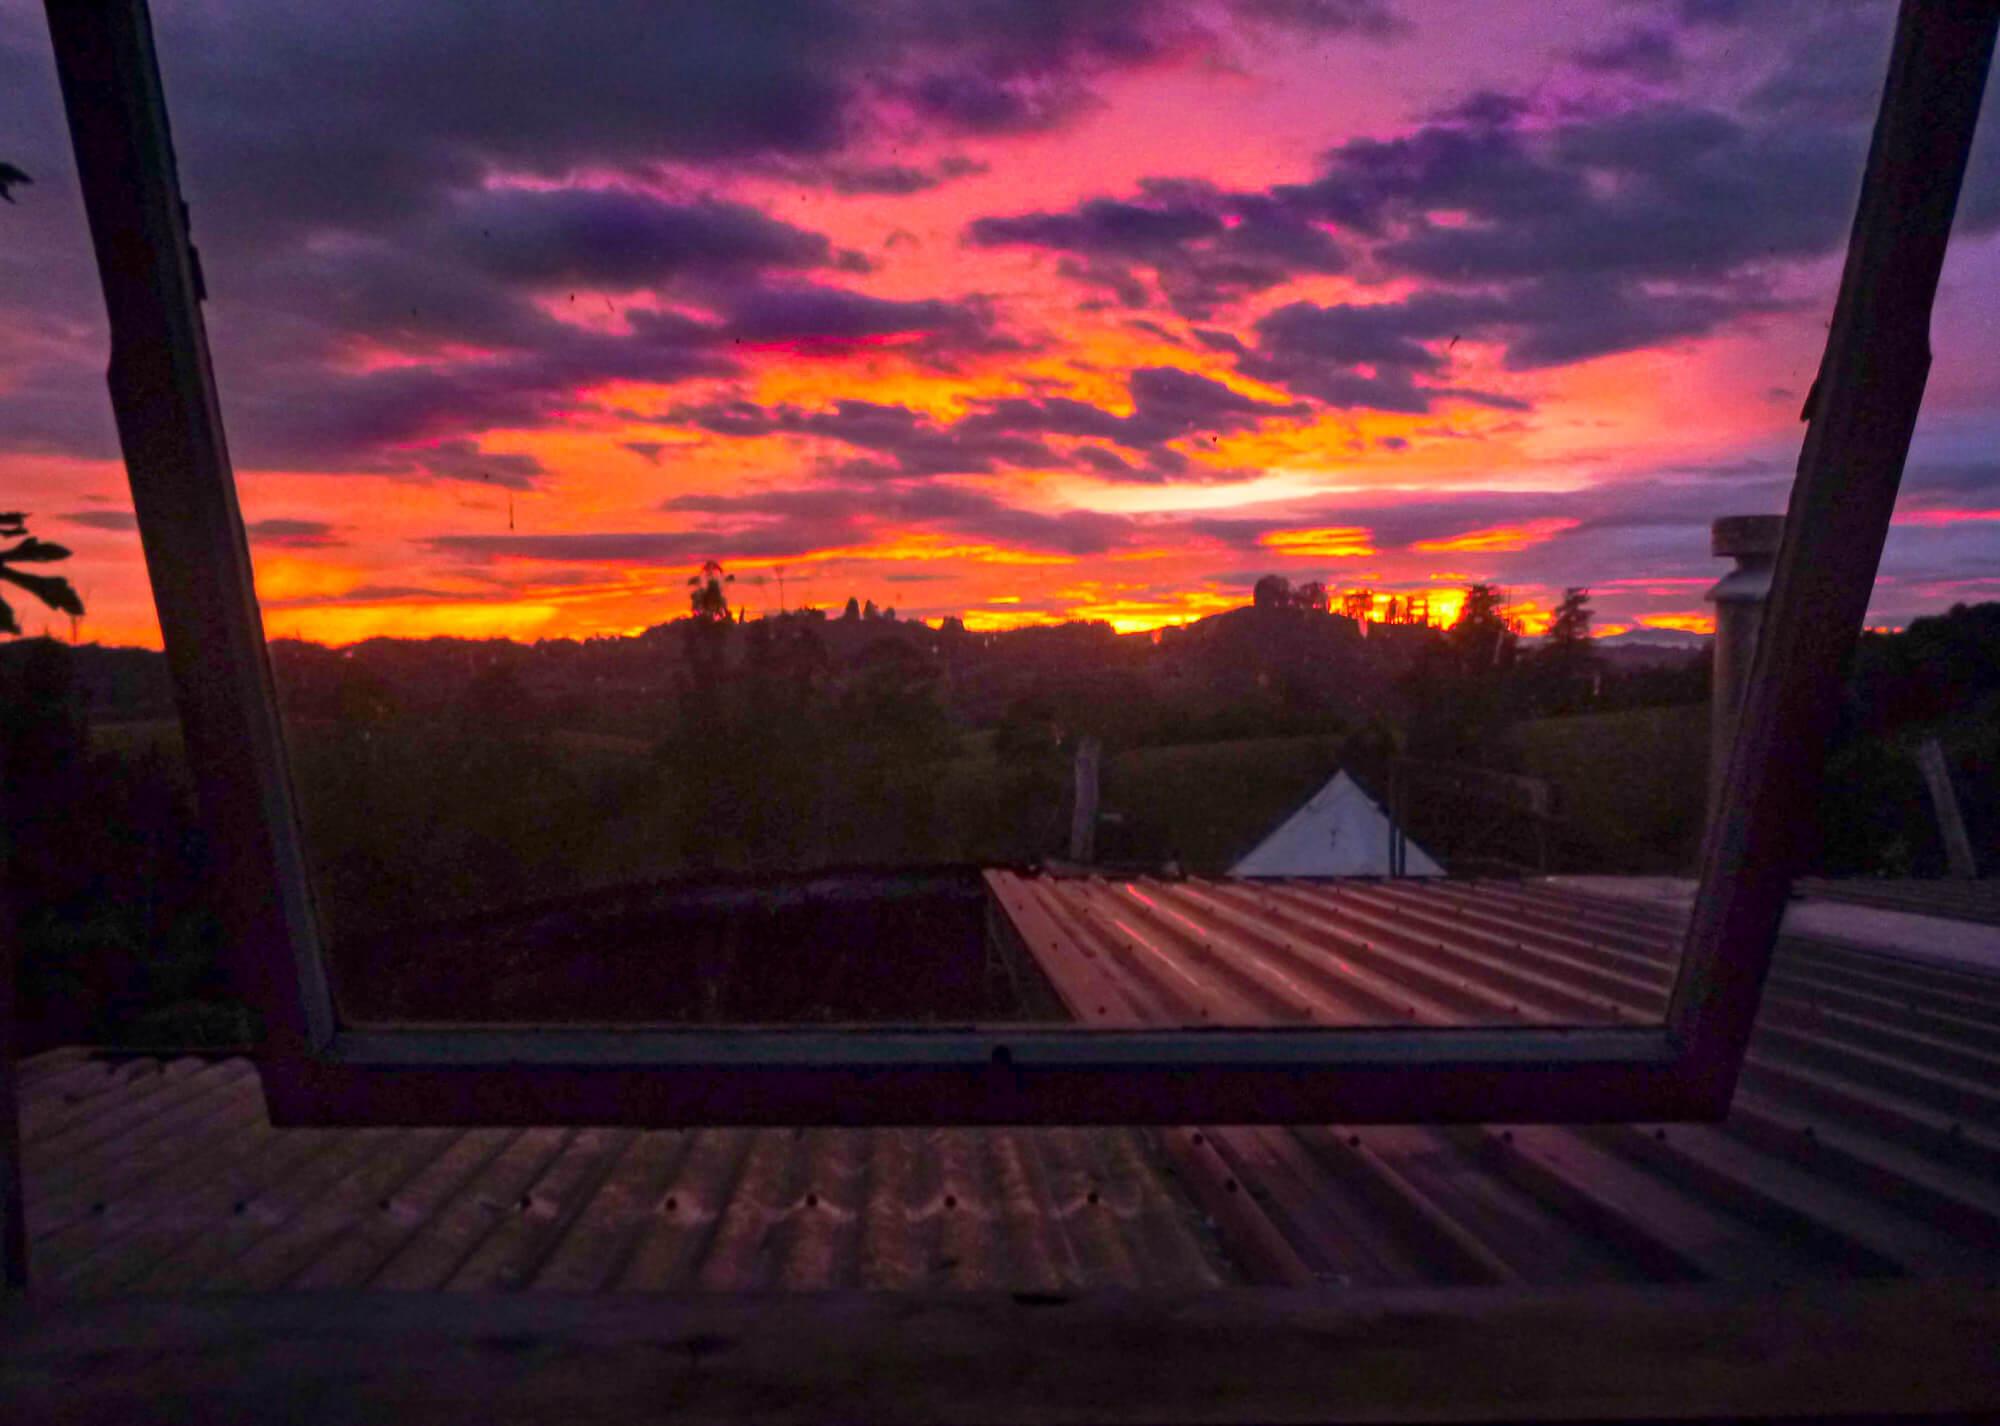 Sunrise at a farm while volunteering abroad